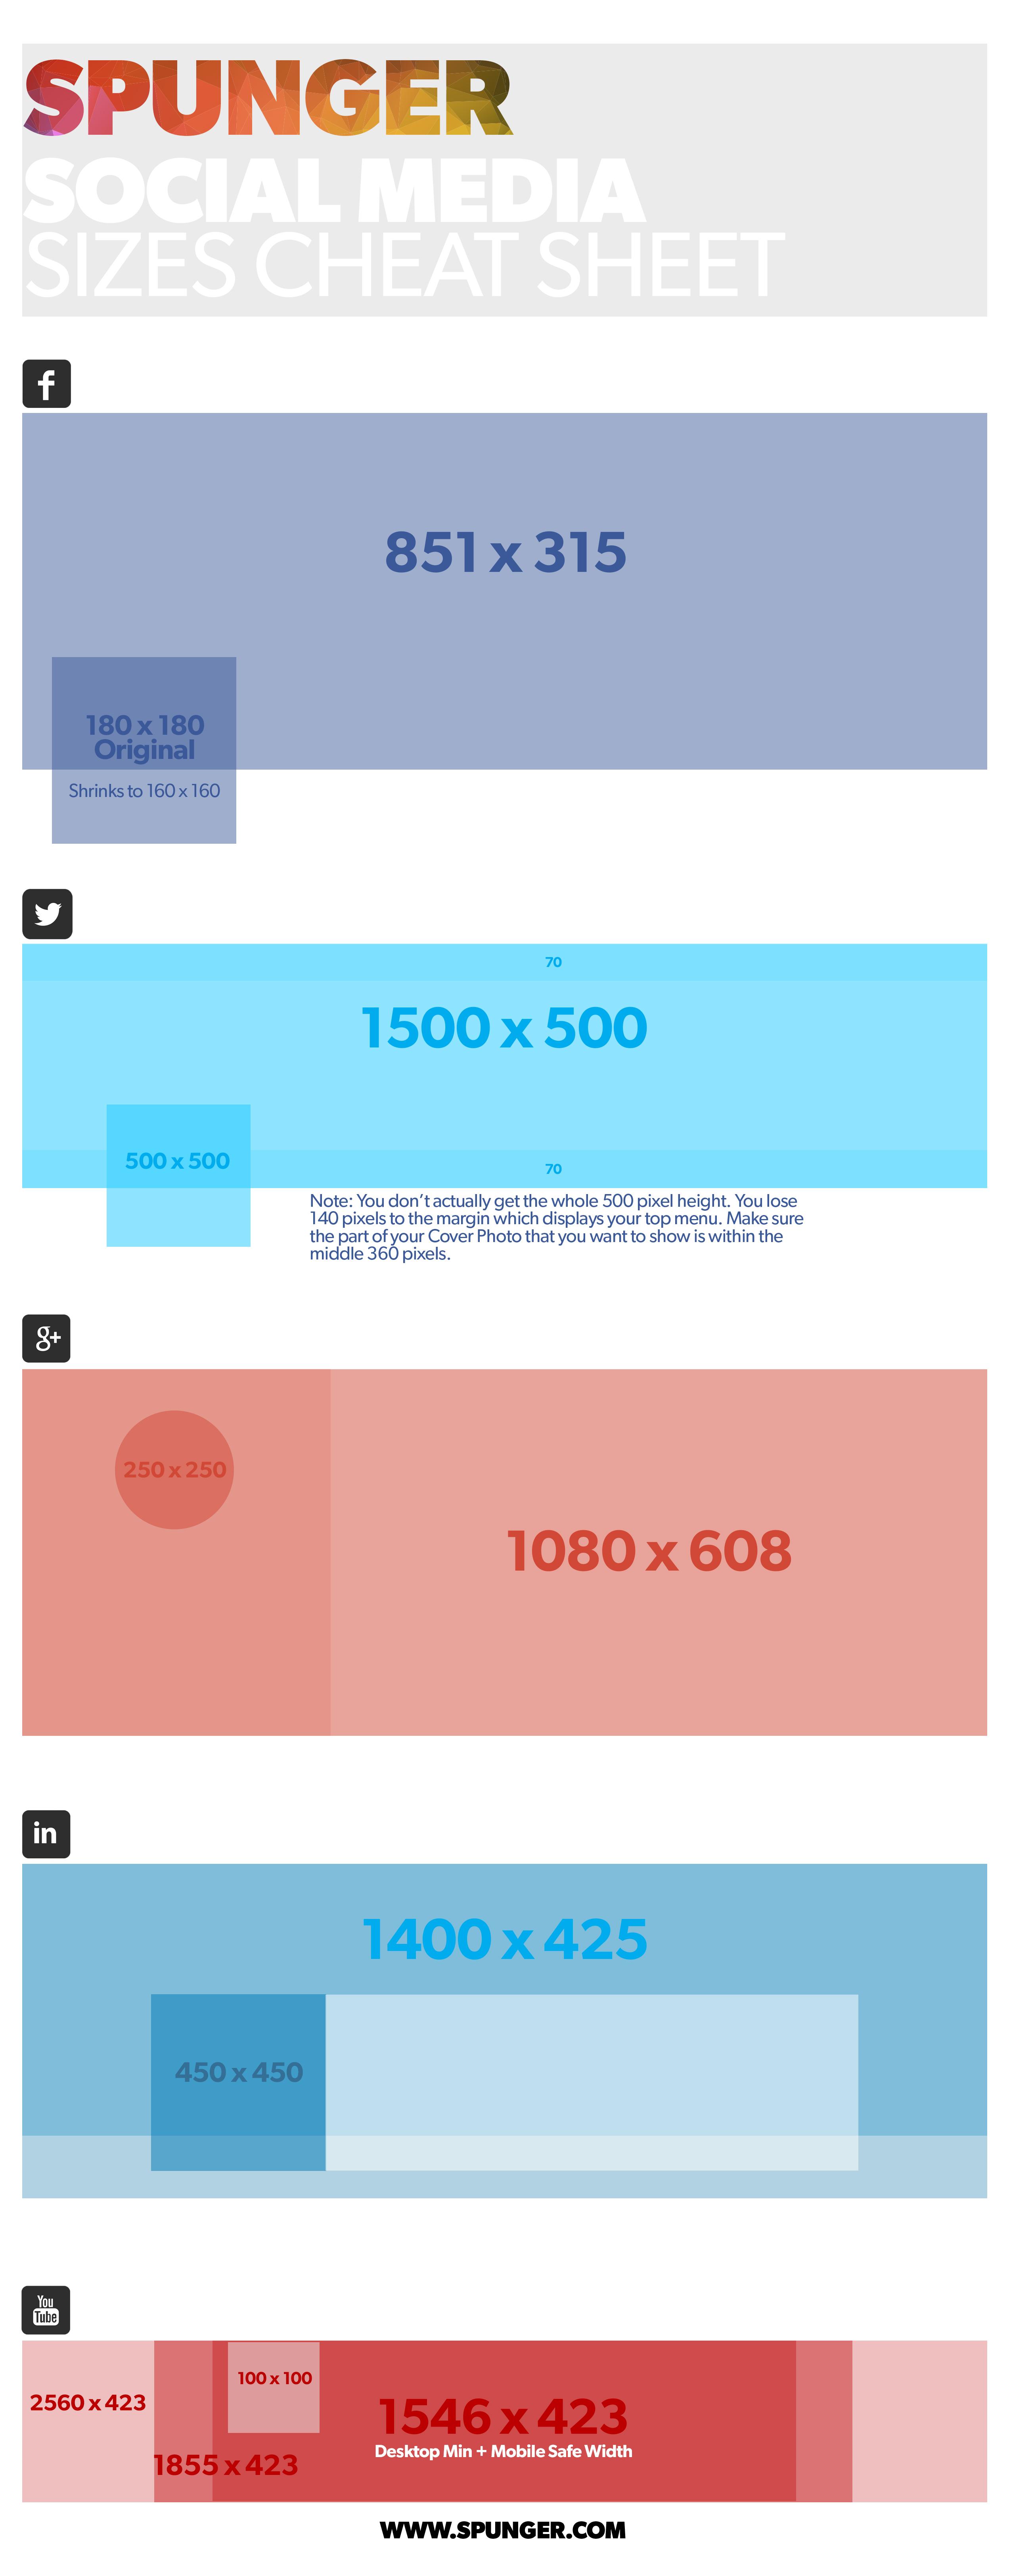 2015 social media sizes